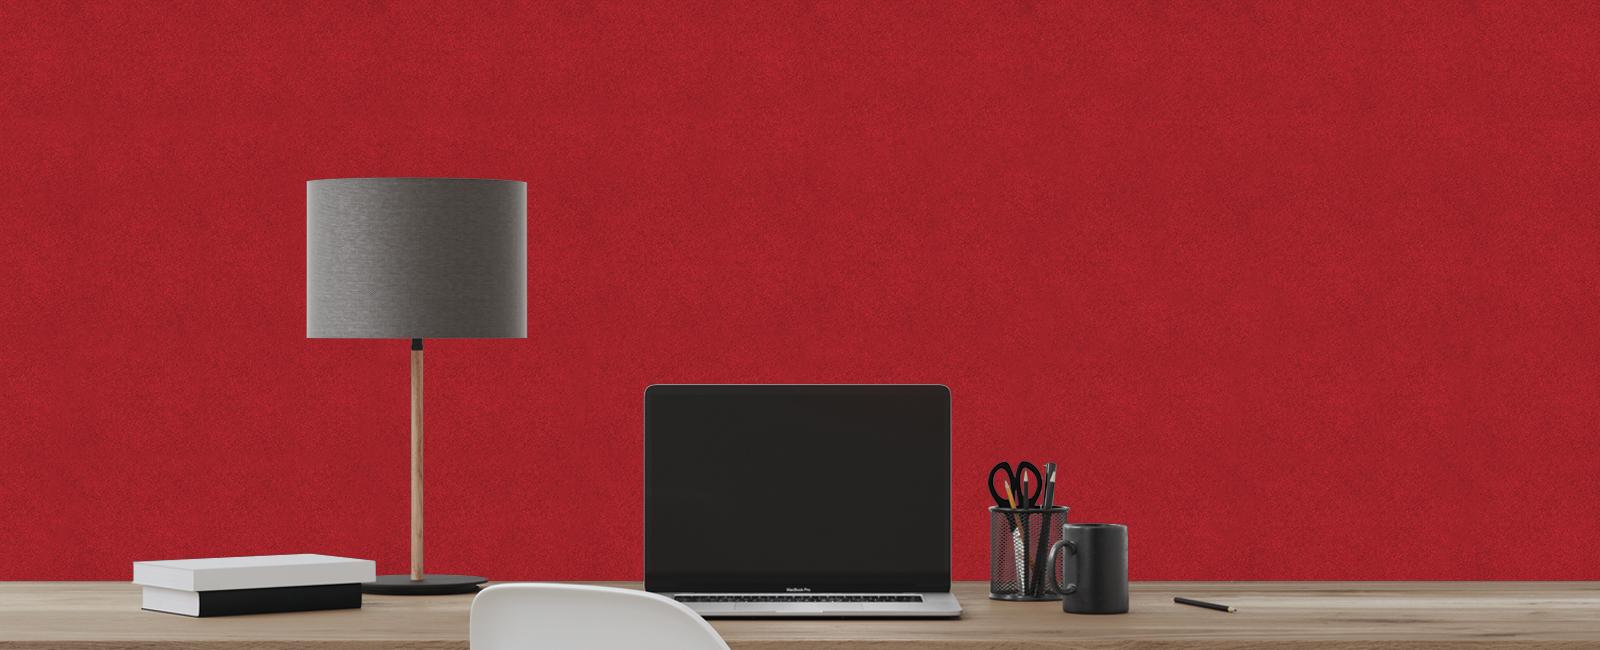 Autex Quietspace Panel | Blazing Red